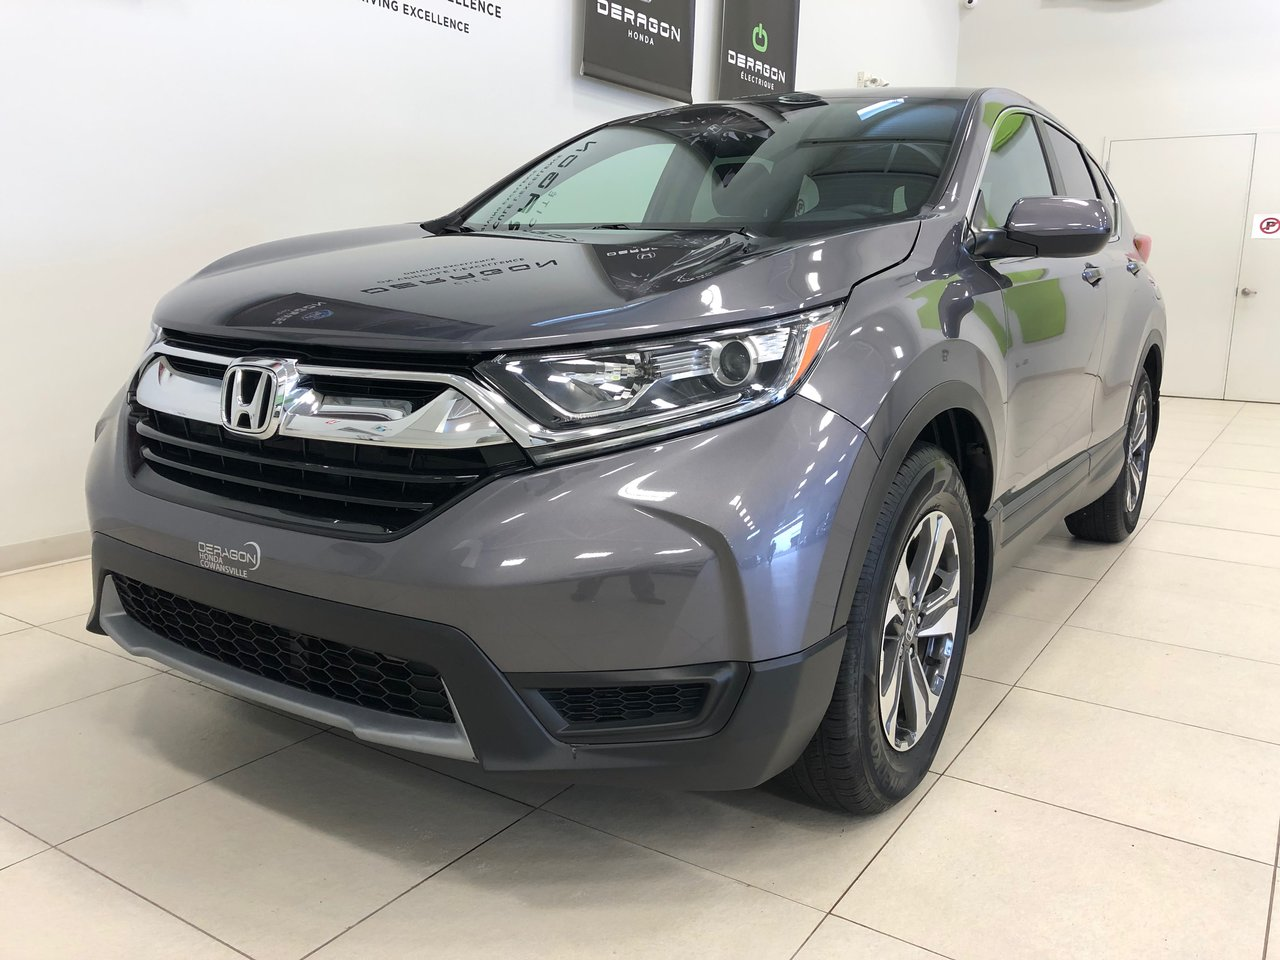 Honda CR-V 2018 LX 1,5L, DEMARREUR, APPLE CARPLAY, ANDROID AU